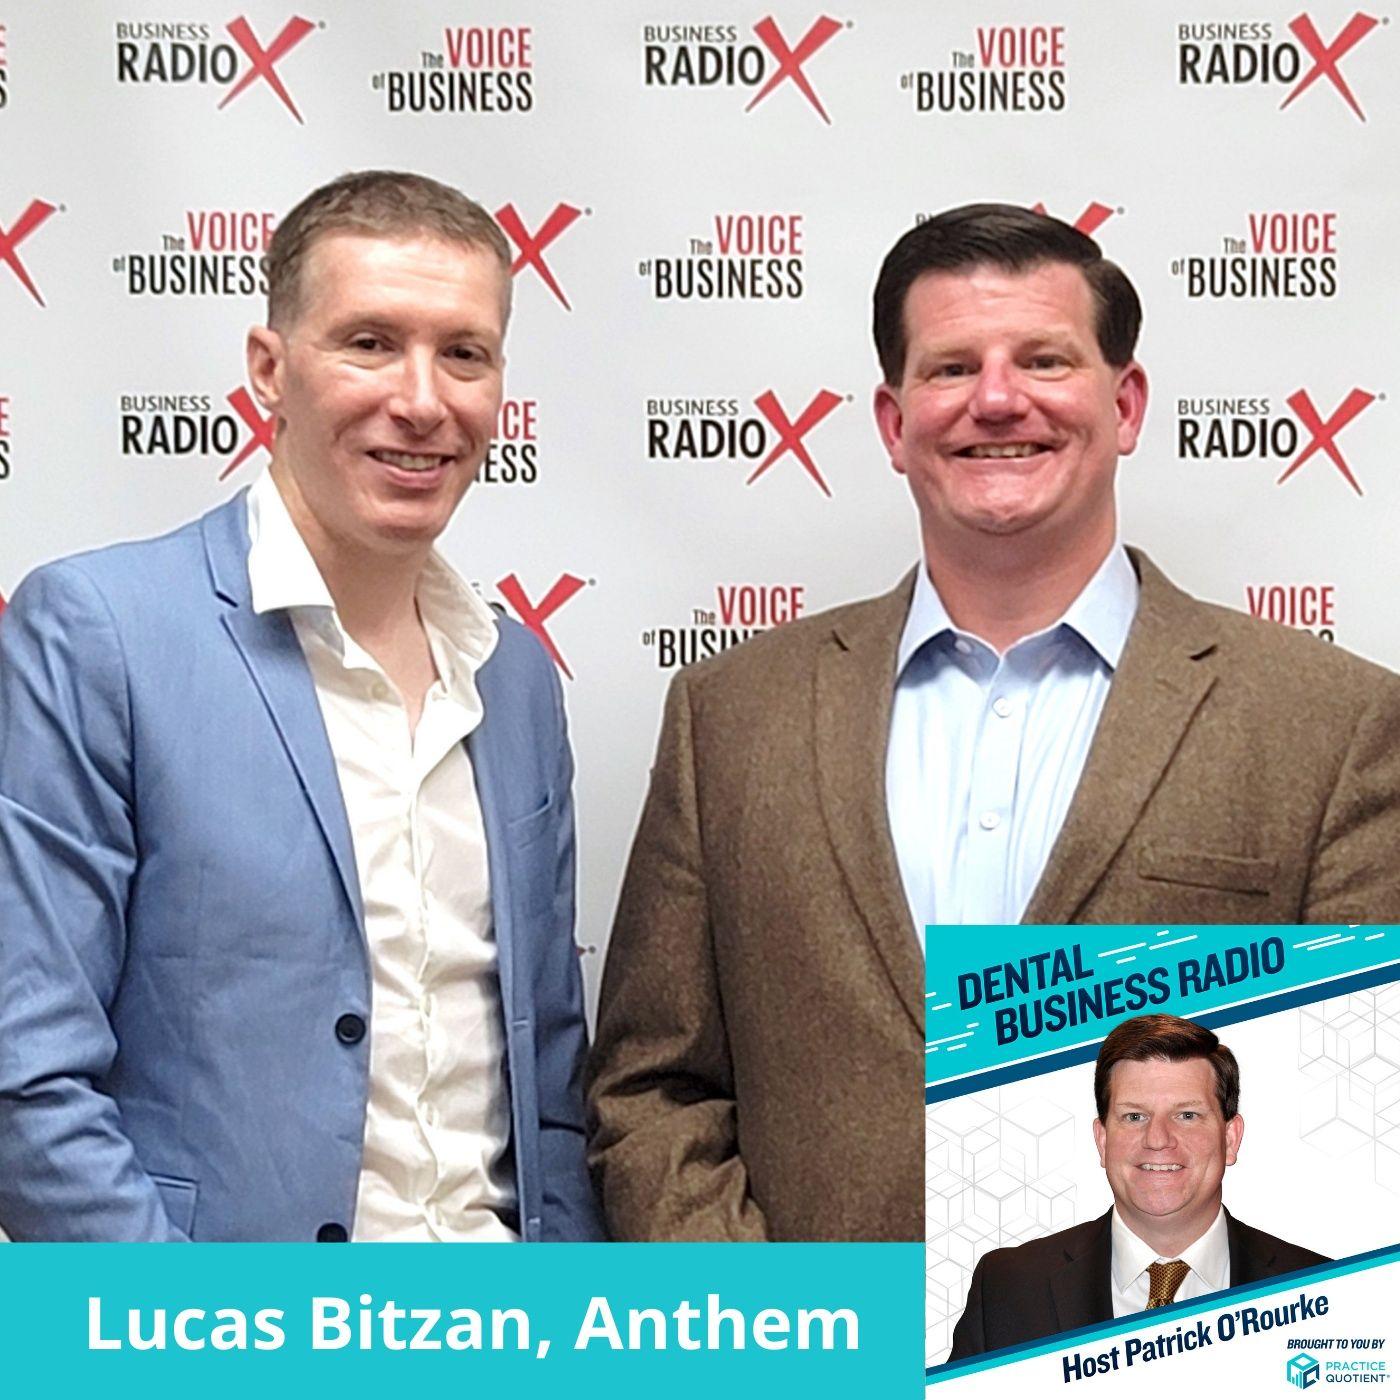 Lucas Bitzan, Anthem